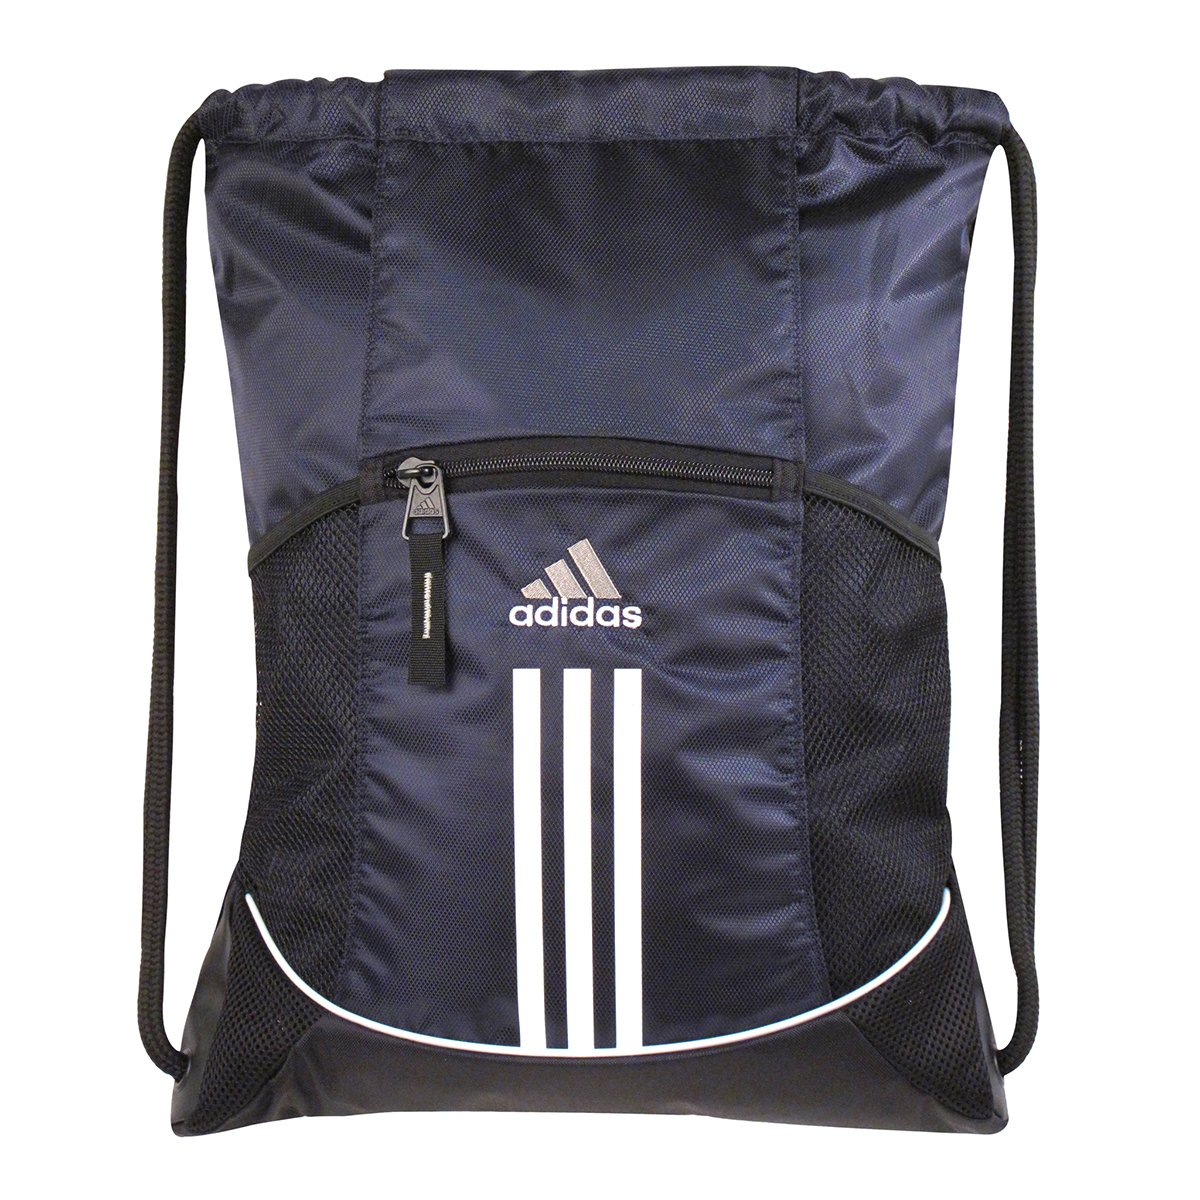 Amazon.com: adidas Alliance Sport Sackpack 5123724 Cobalt, One ...